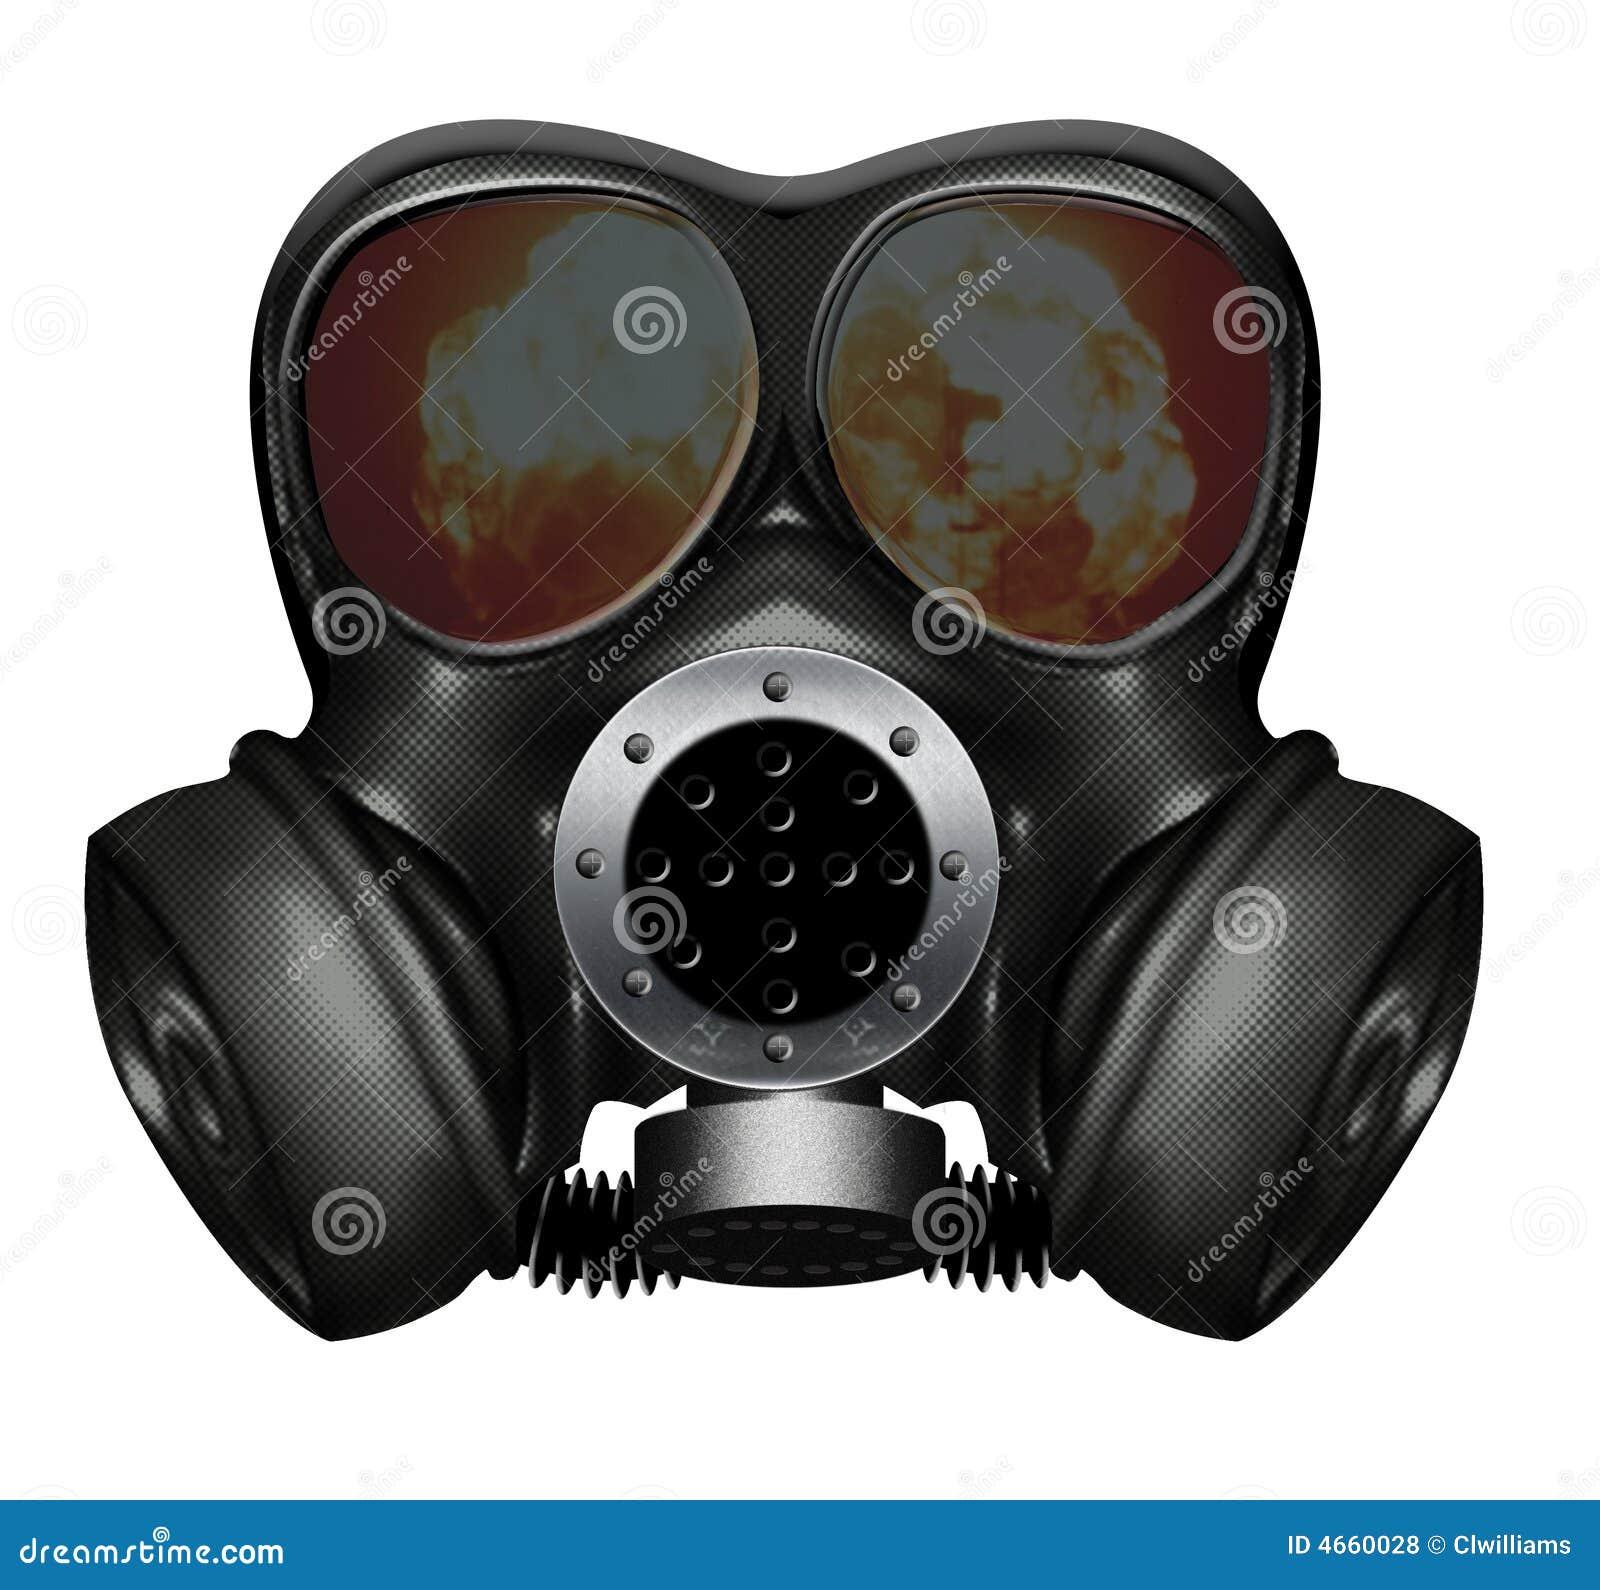 masque de gaz photos libres de droits image 4660028. Black Bedroom Furniture Sets. Home Design Ideas